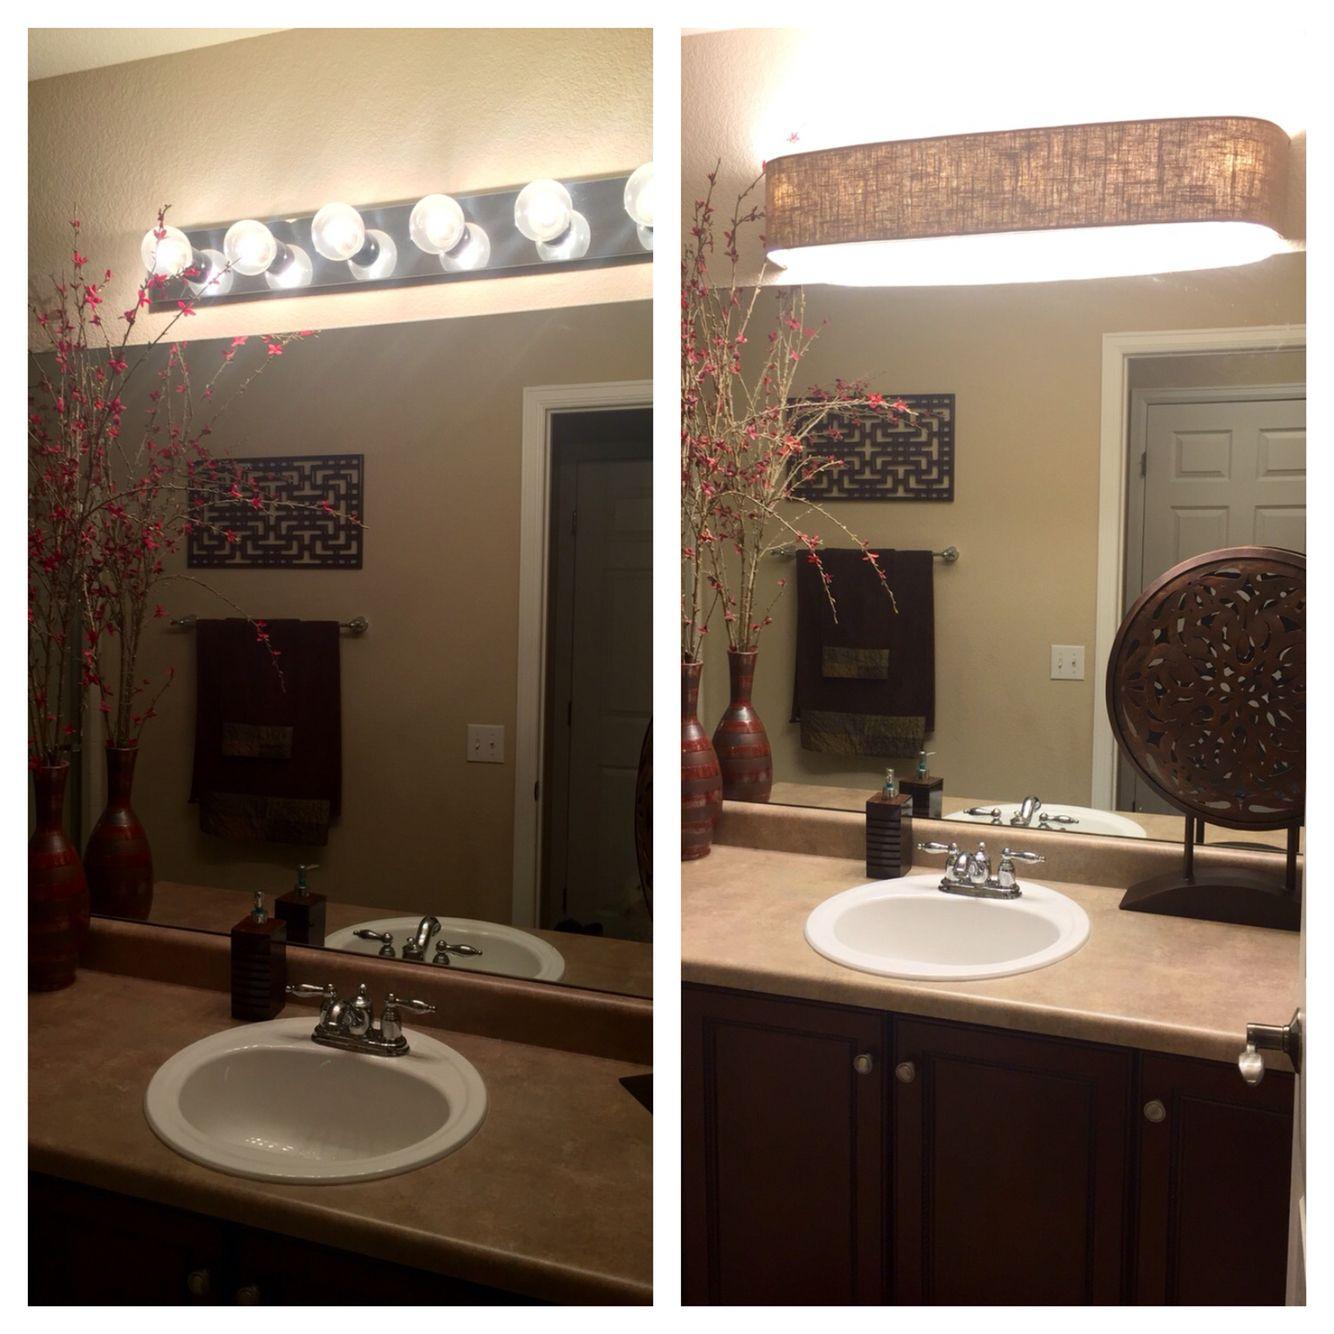 My New Bathroom Light Cover Courtesy Of Http M Vanityshadesofvegas Com Url Http Www Vanityshadeso Fixtures Diy Diy Light Fixtures Bathroom Light Fixtures